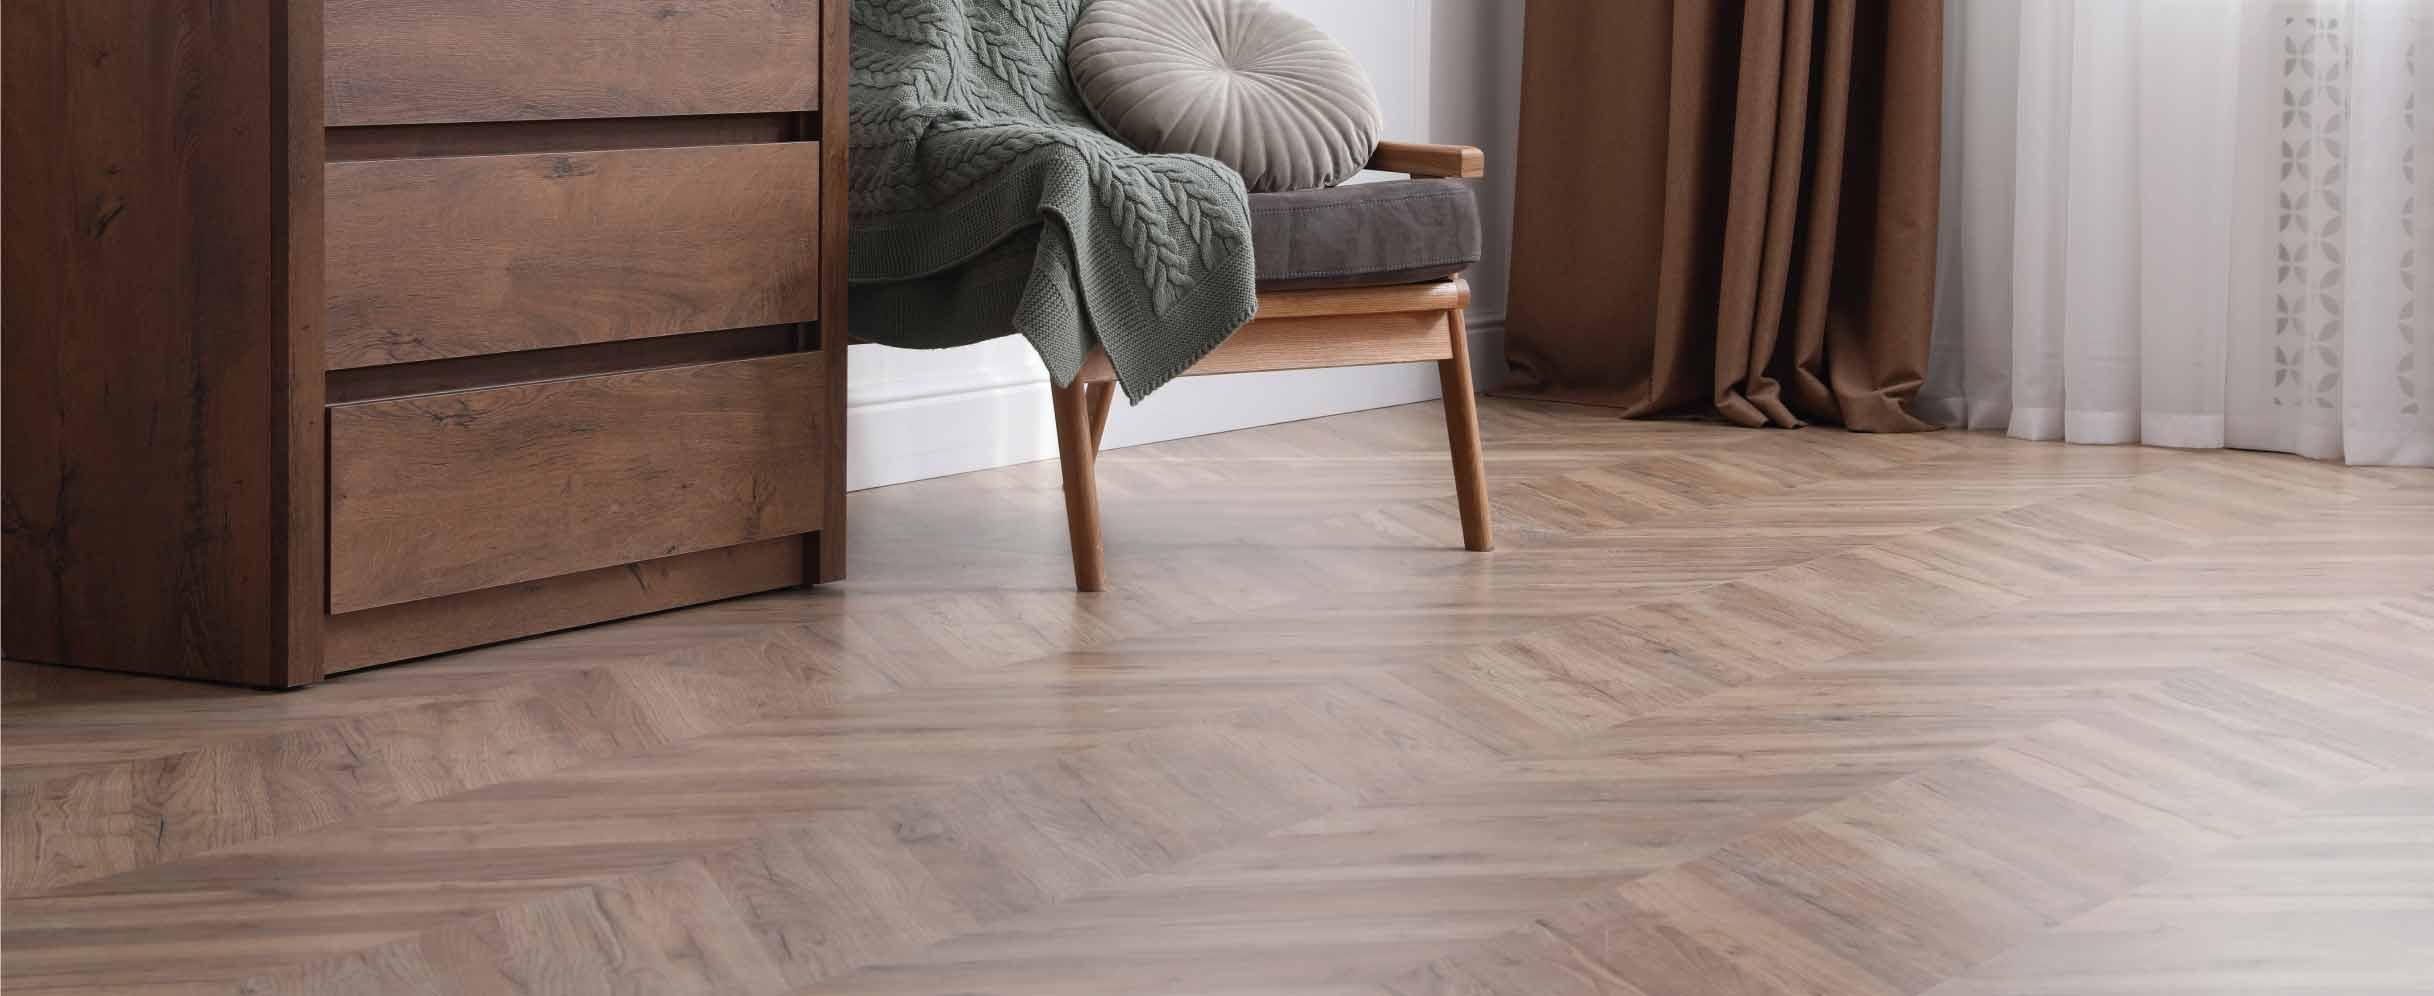 Satoree Flooring